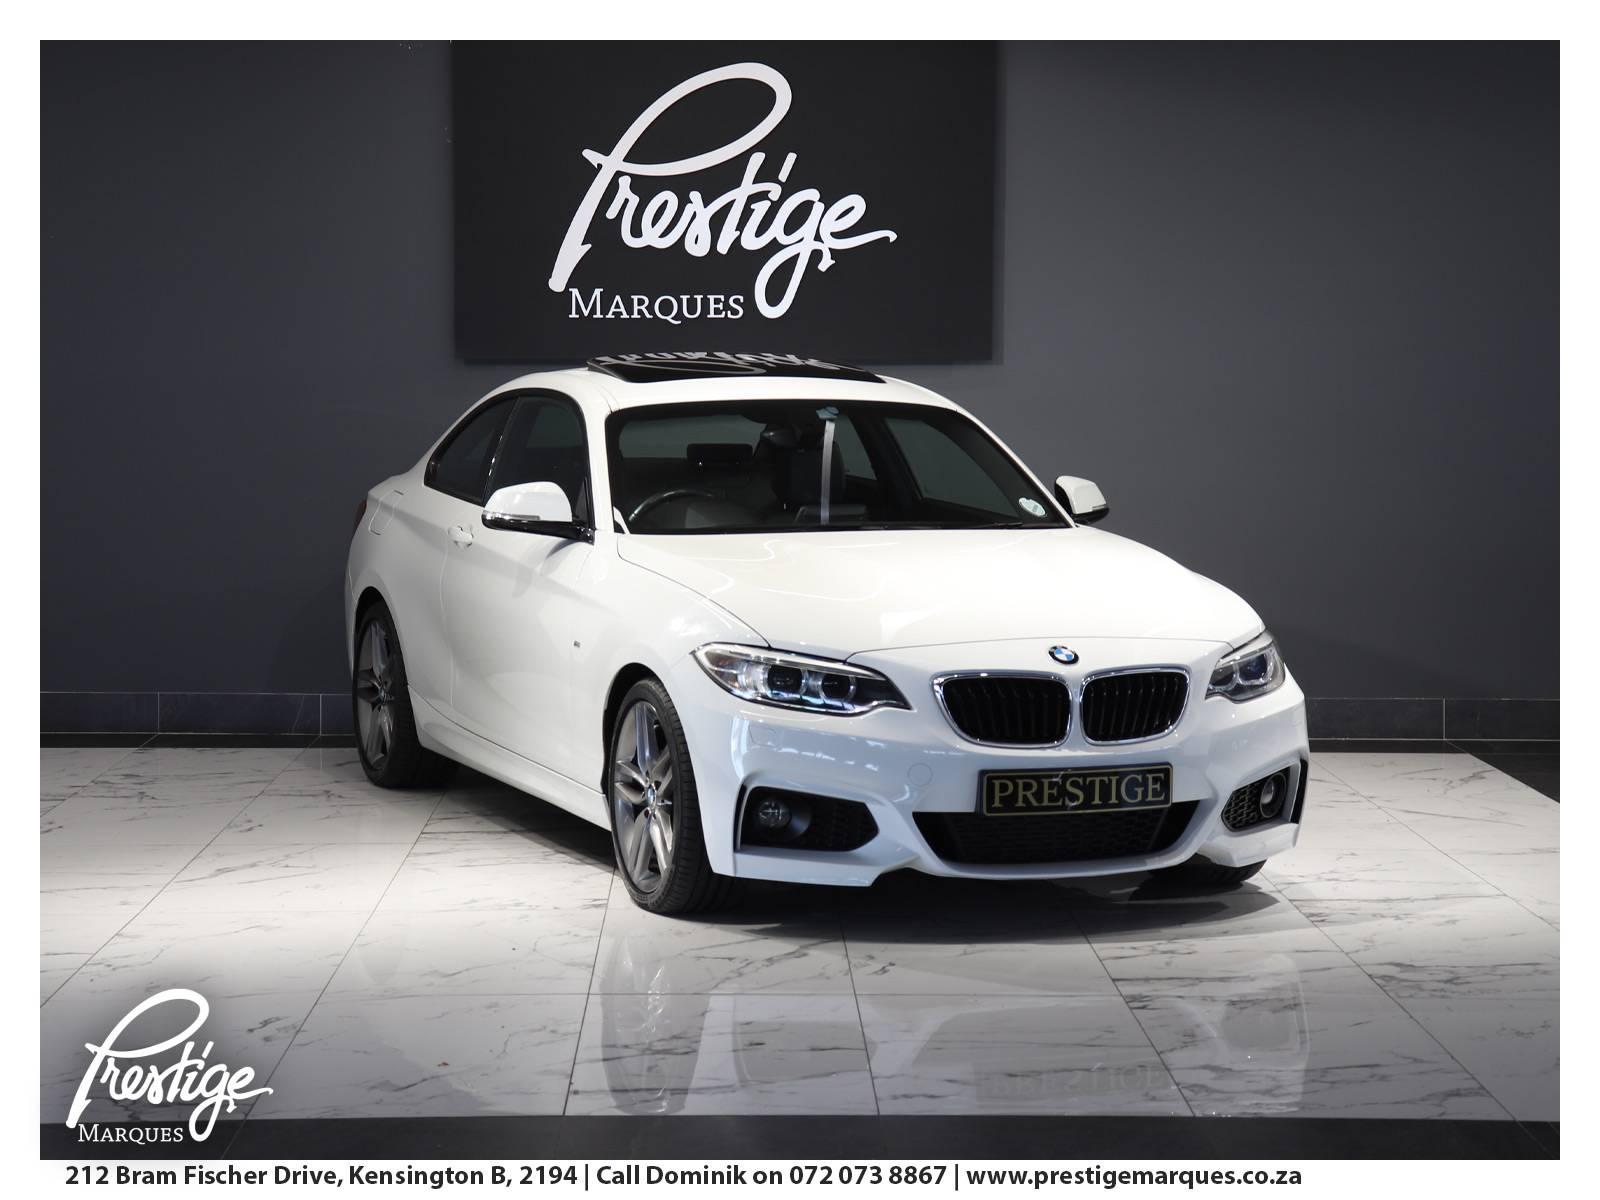 2015_BMW-2 series-220d-Prestige-Marques-Randburg-Sandton-1